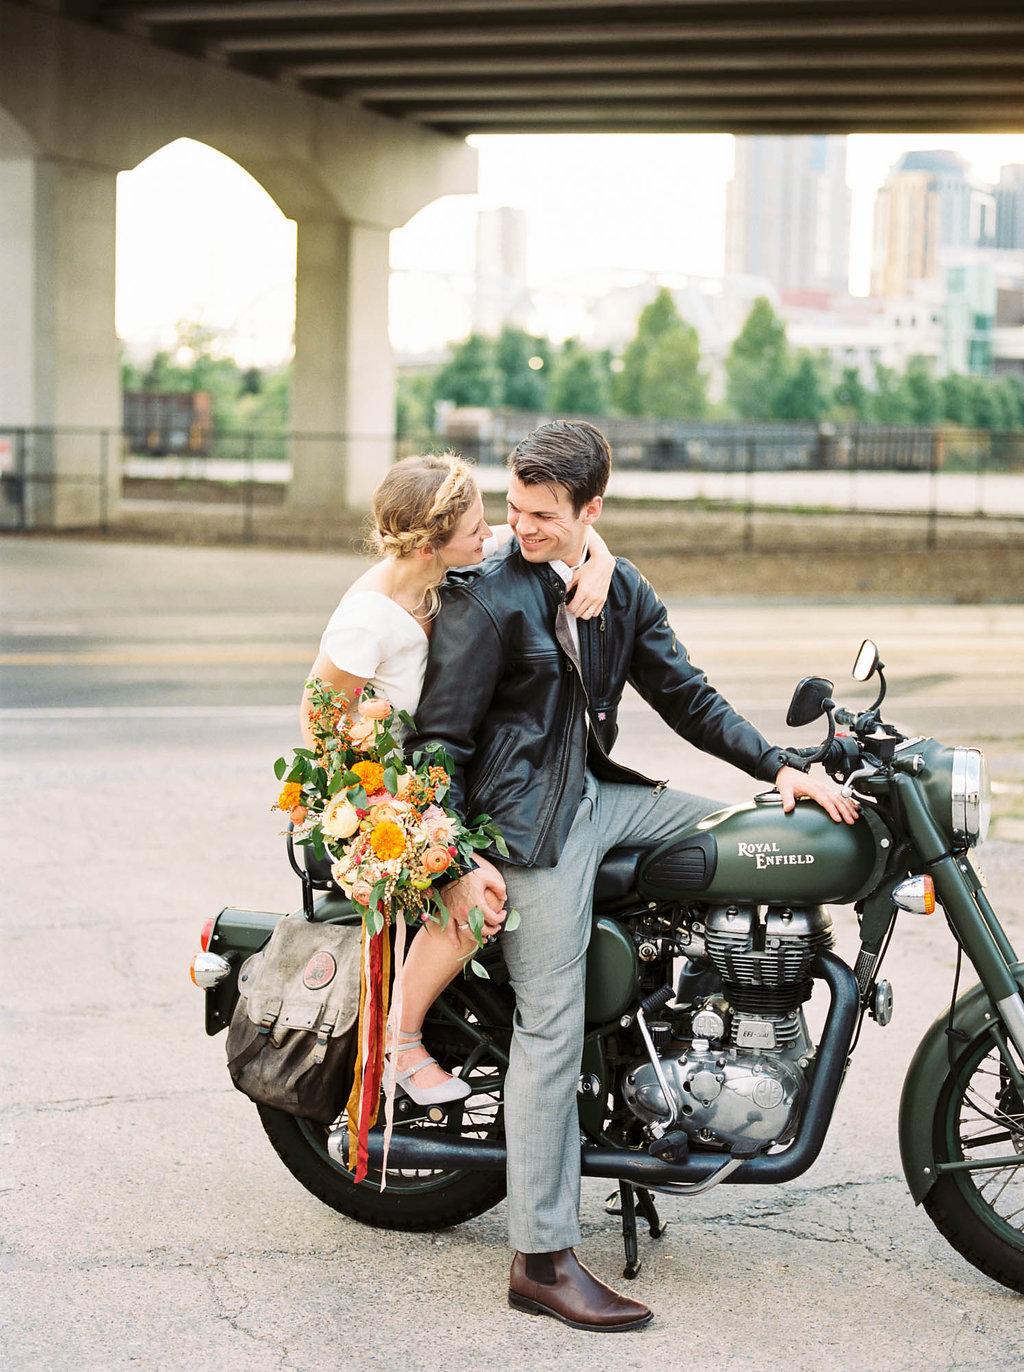 Motorcycle getaway // Nashville Wedding Floral Design